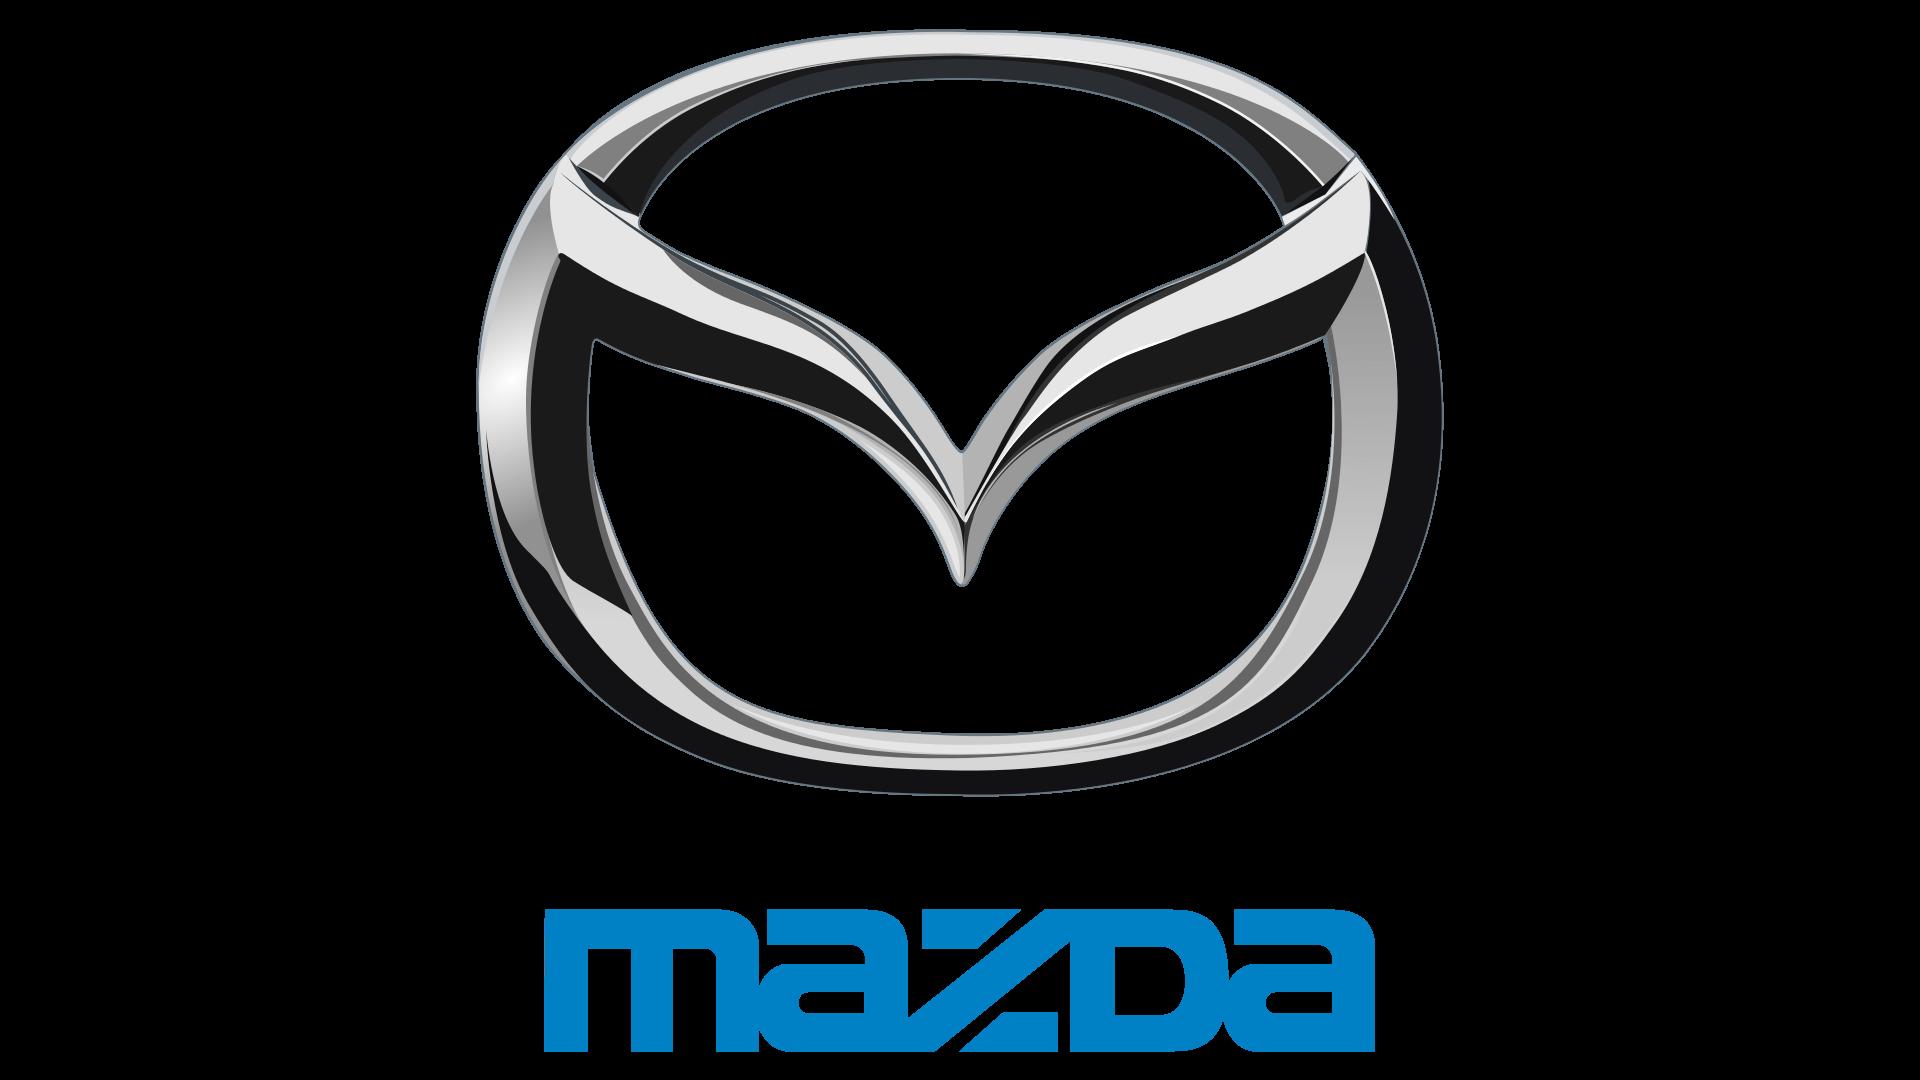 Car Logo Mazda - Carlogo HD PNG